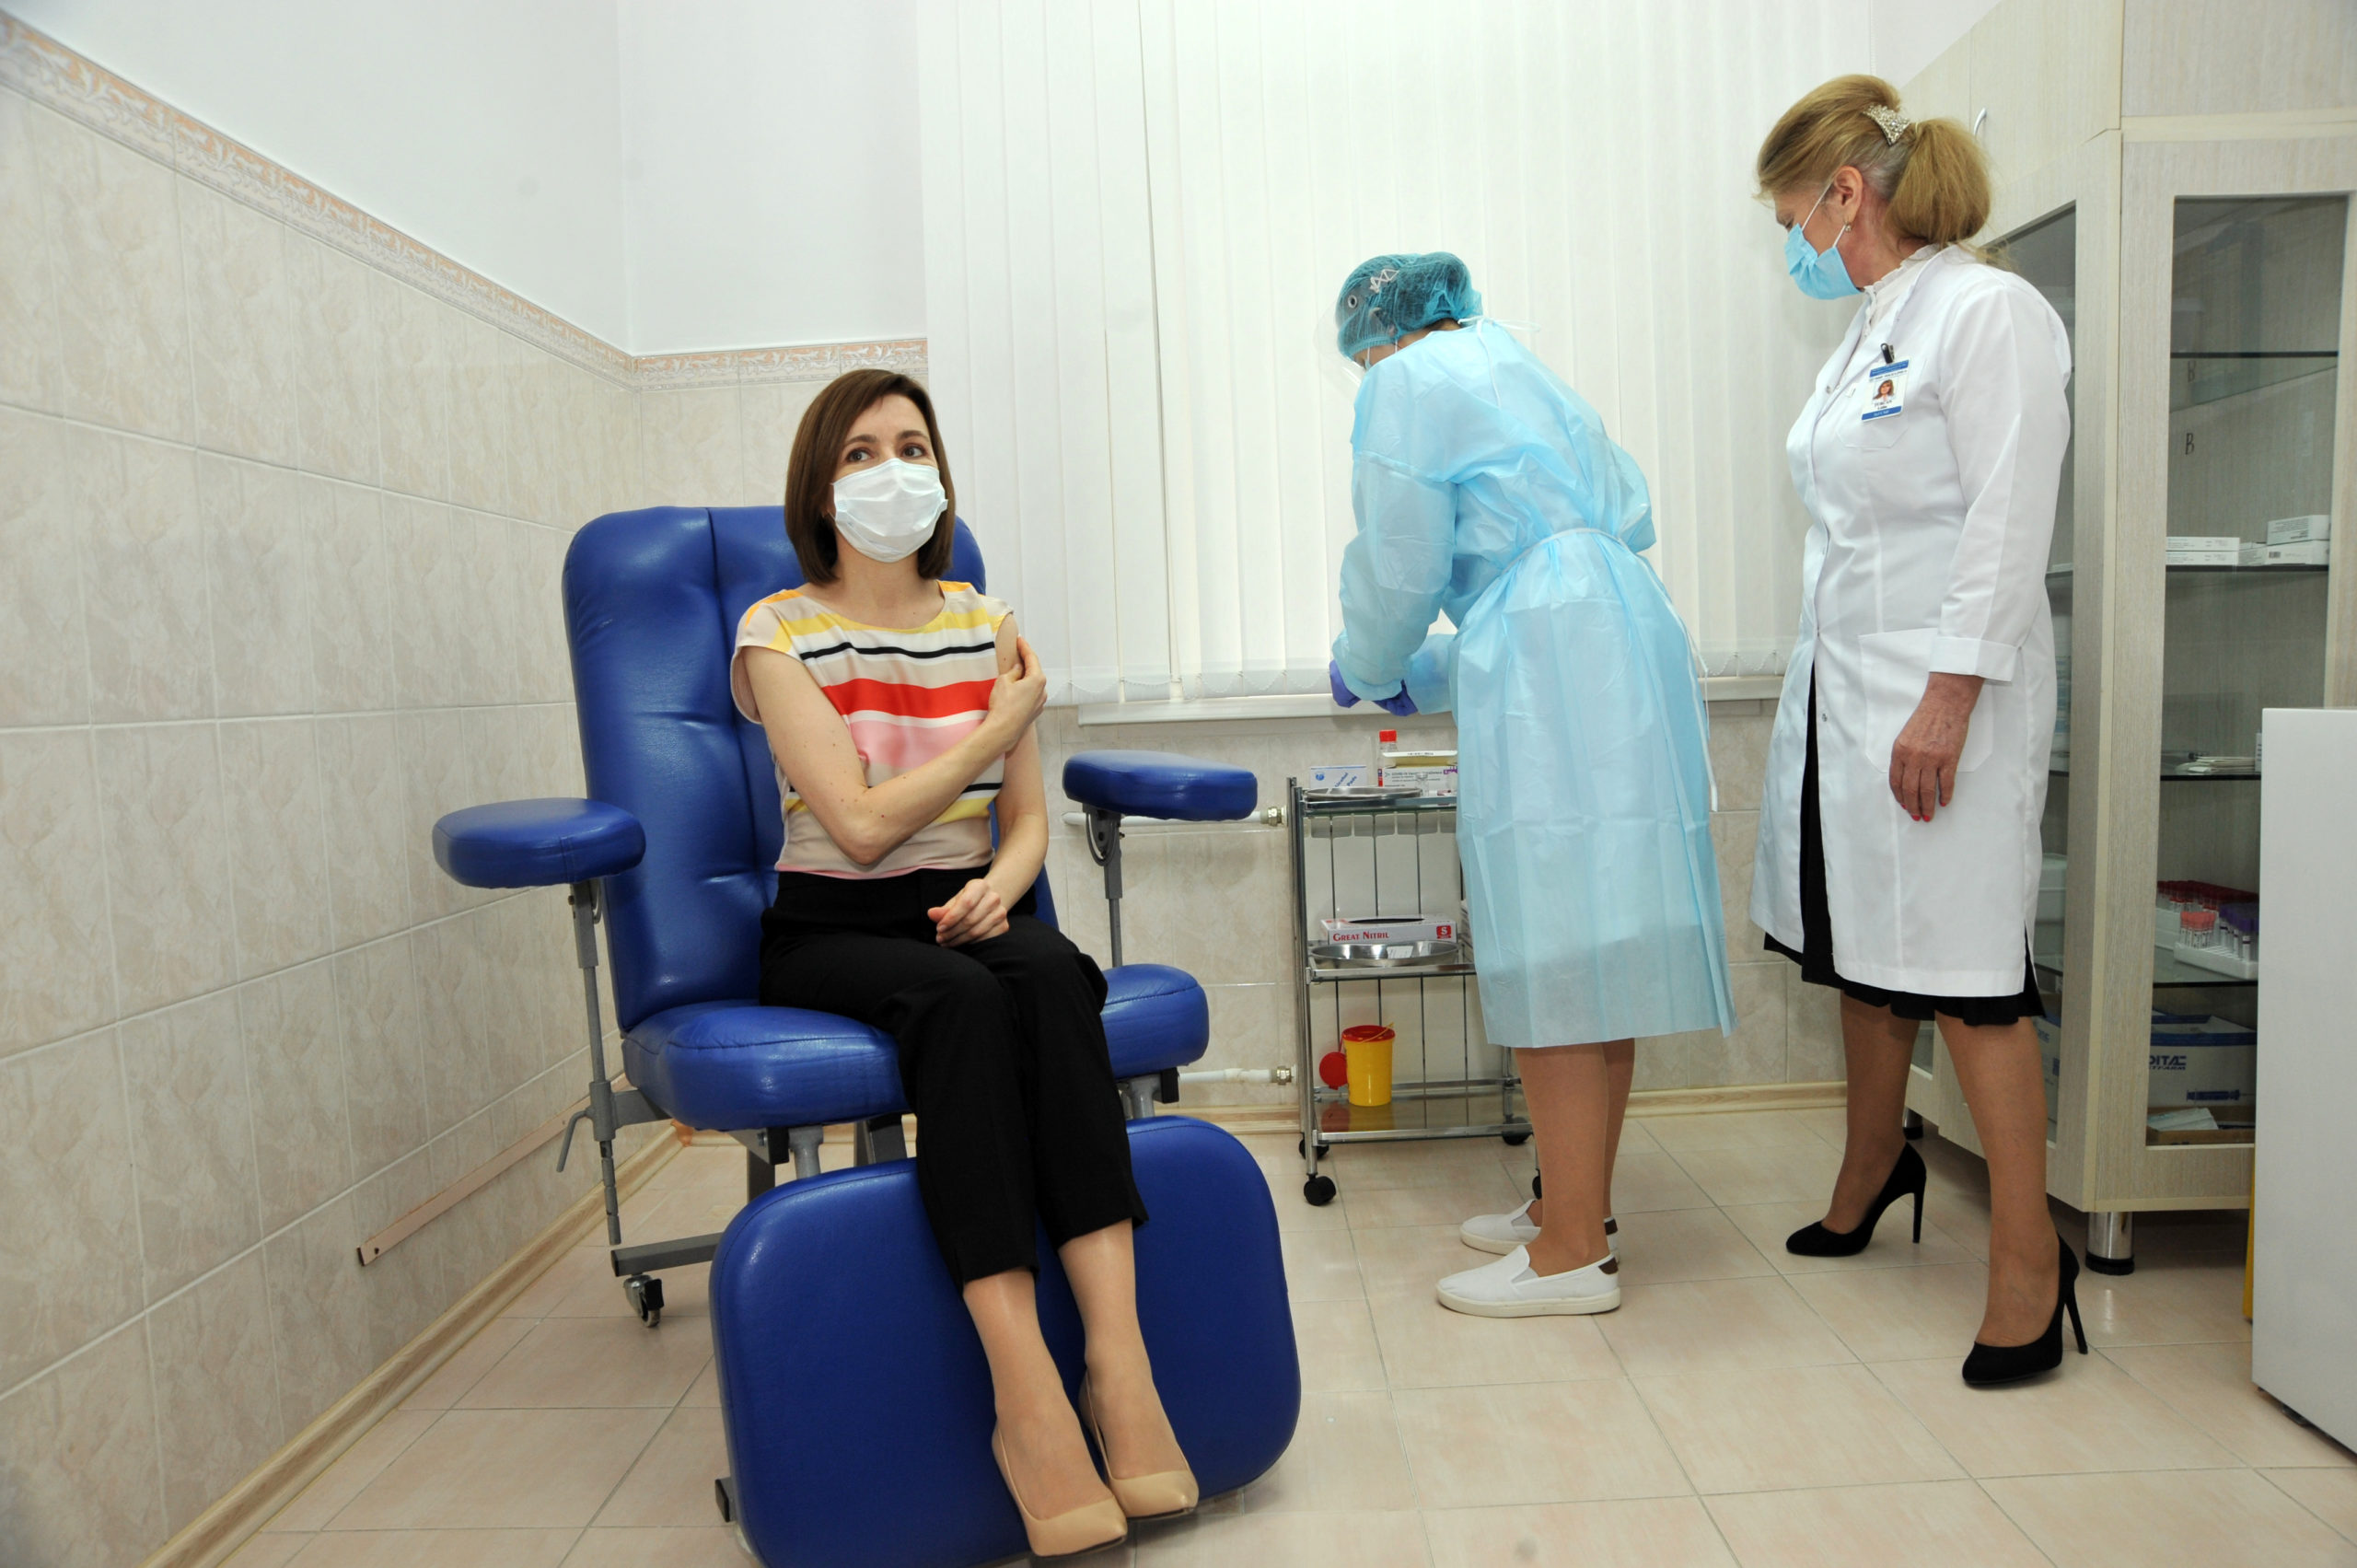 «Защитите свою жизнь!». Санду вакцинировалась откоронавируса (Фоторепортаж NM)